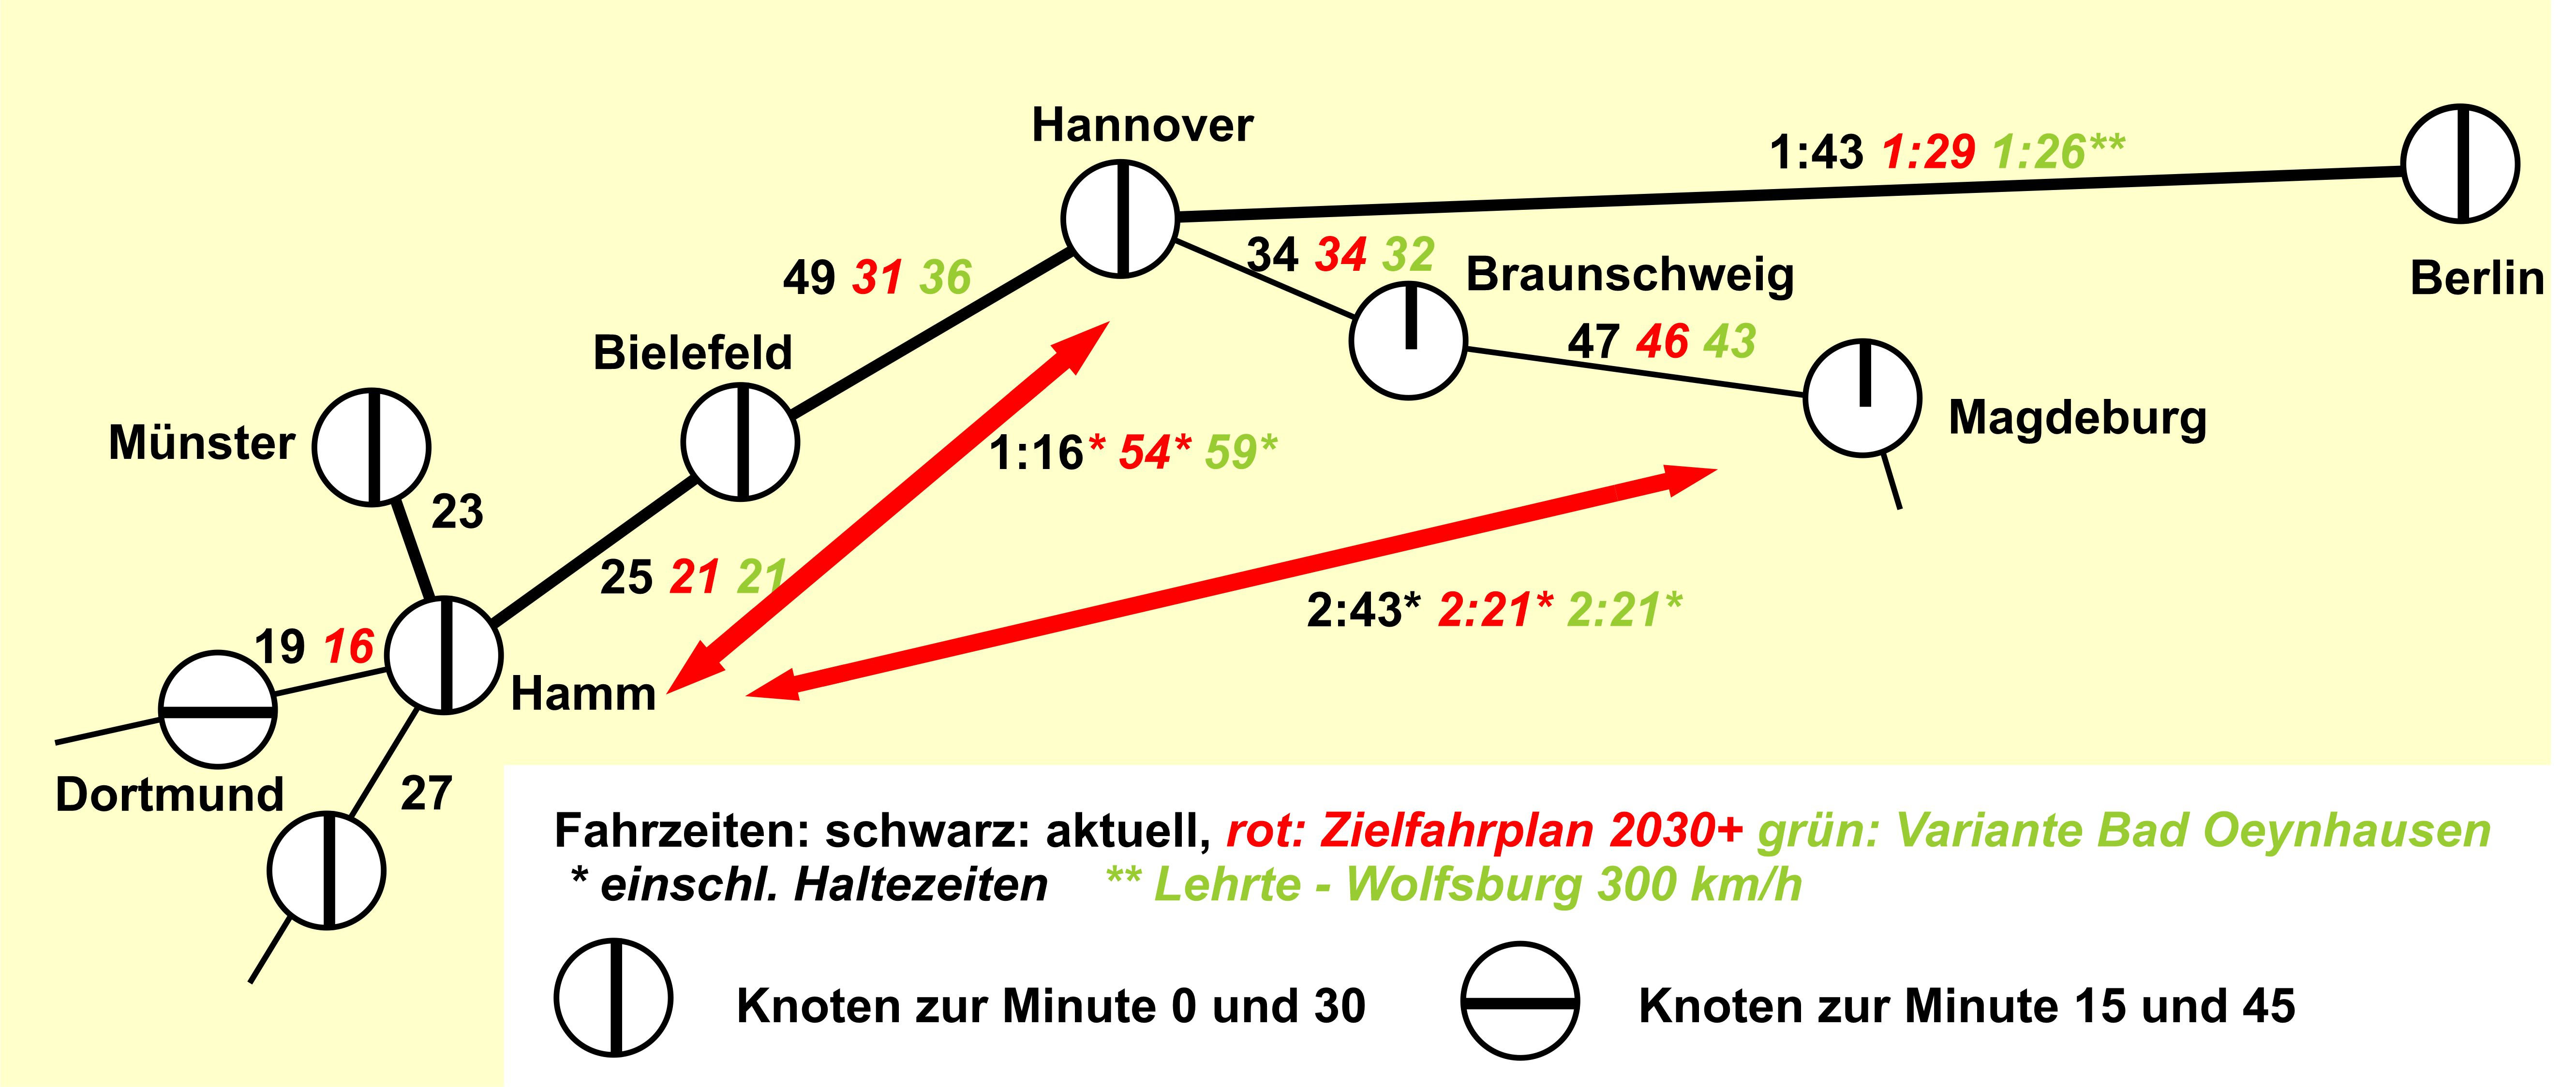 Skizze der Taktknoten